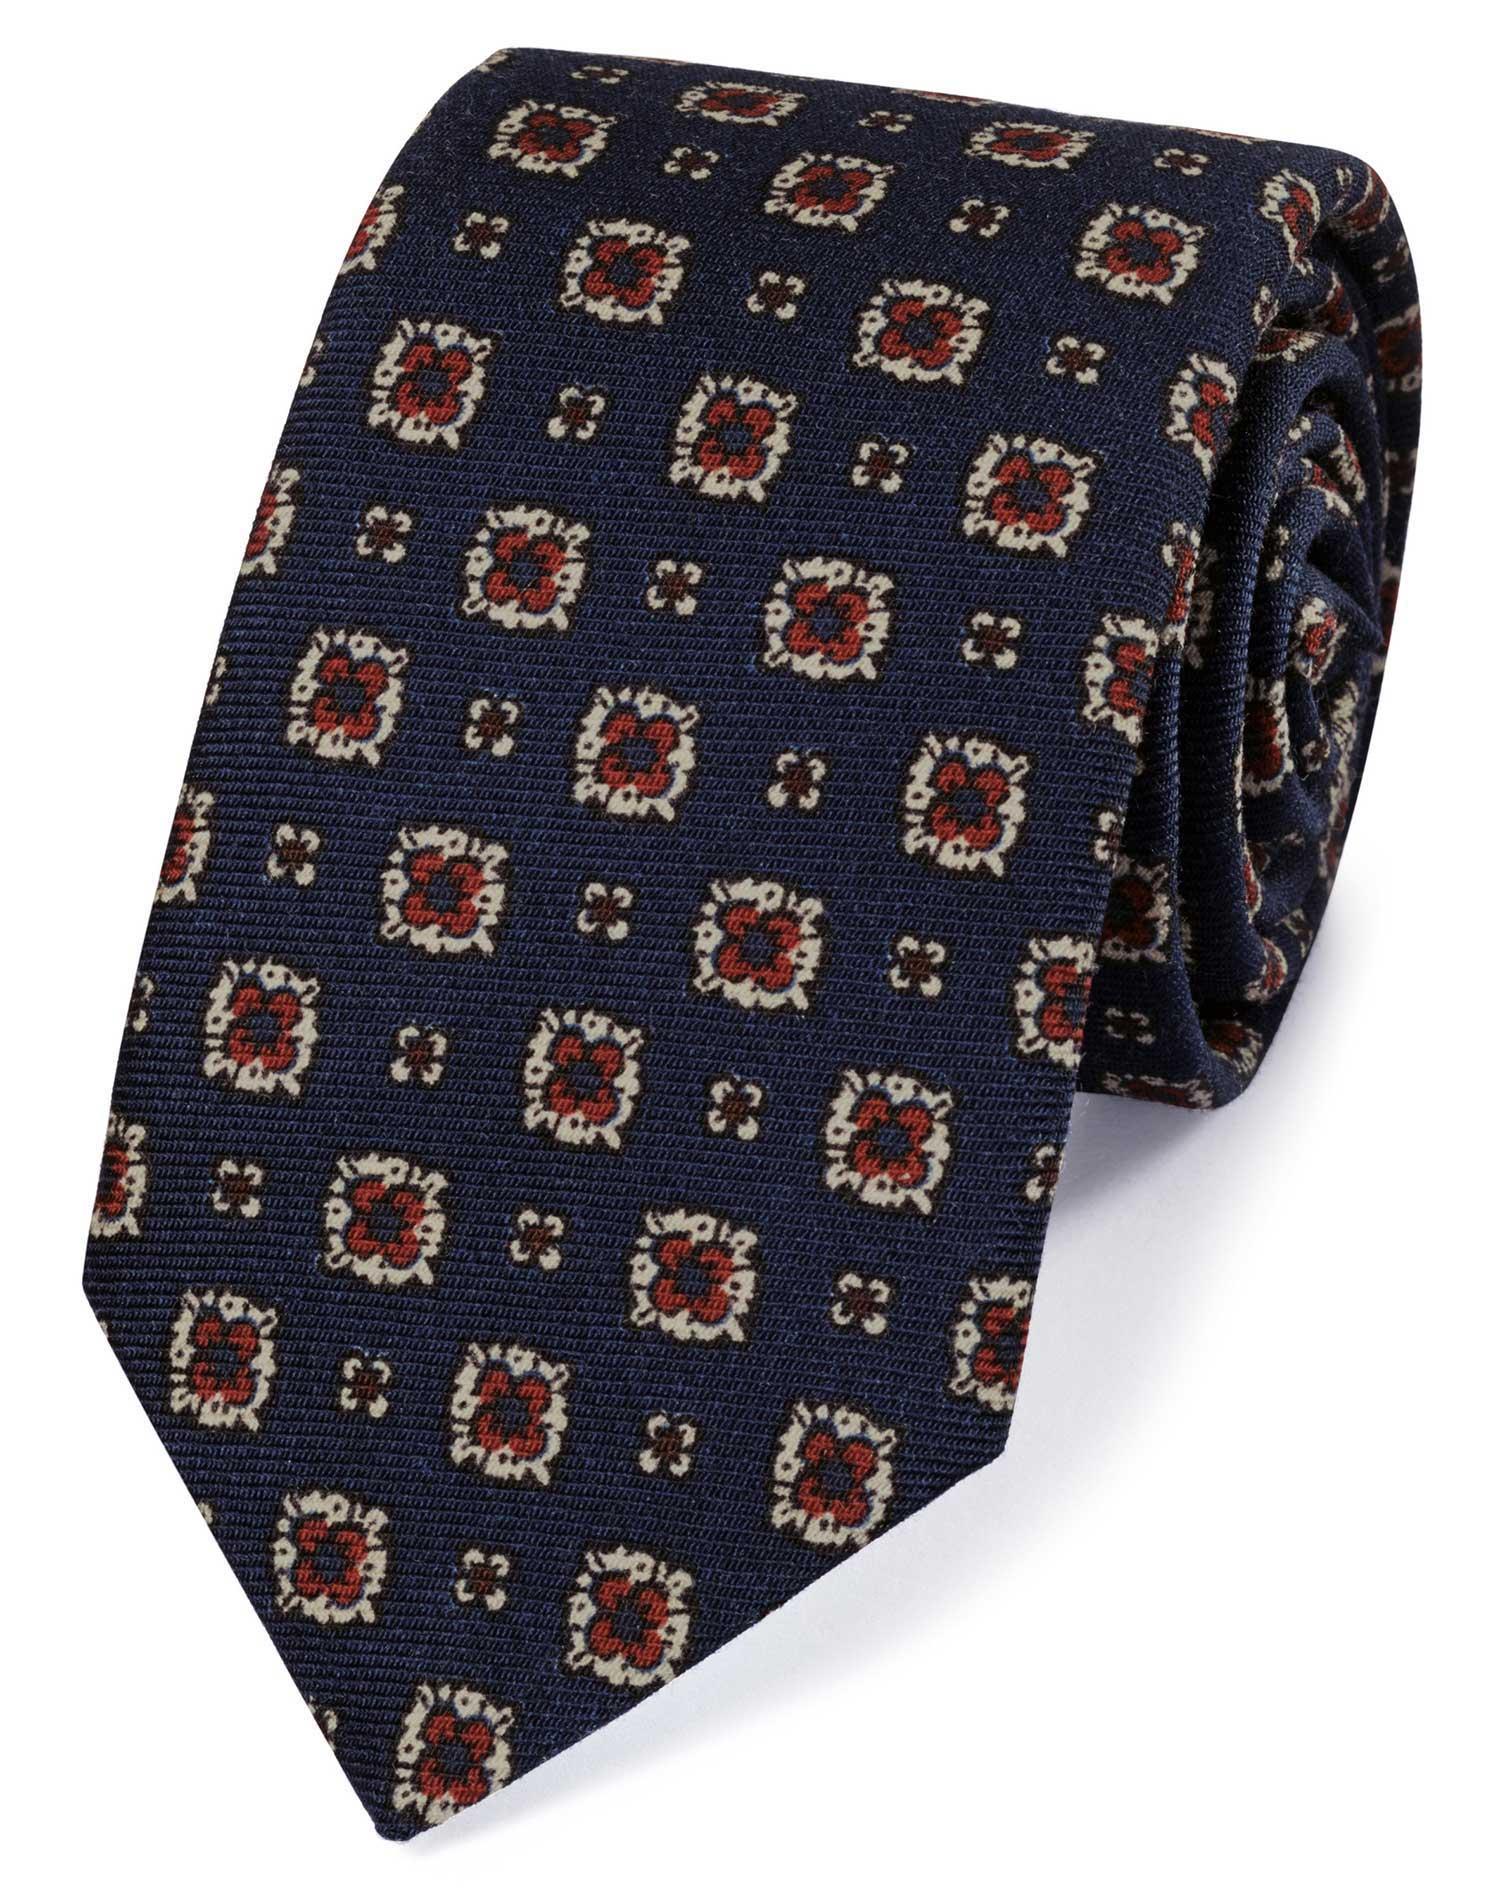 cravate de luxe bleu marine et rouge en laine italienne avec imprim charles tyrwhitt. Black Bedroom Furniture Sets. Home Design Ideas